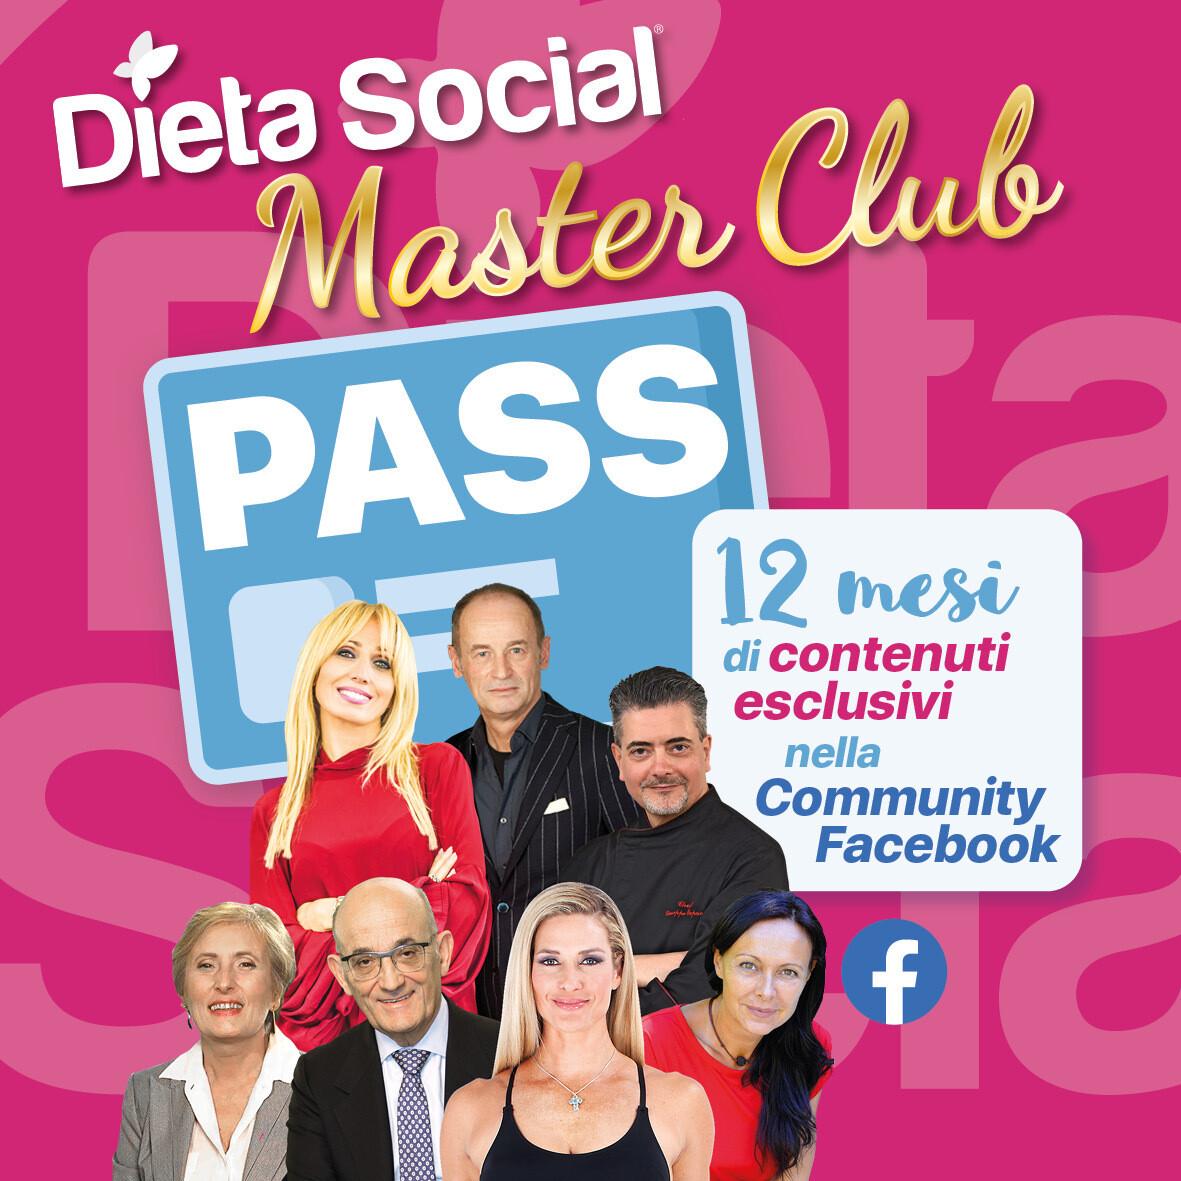 PASS 12 mesi Dieta Social Master Club